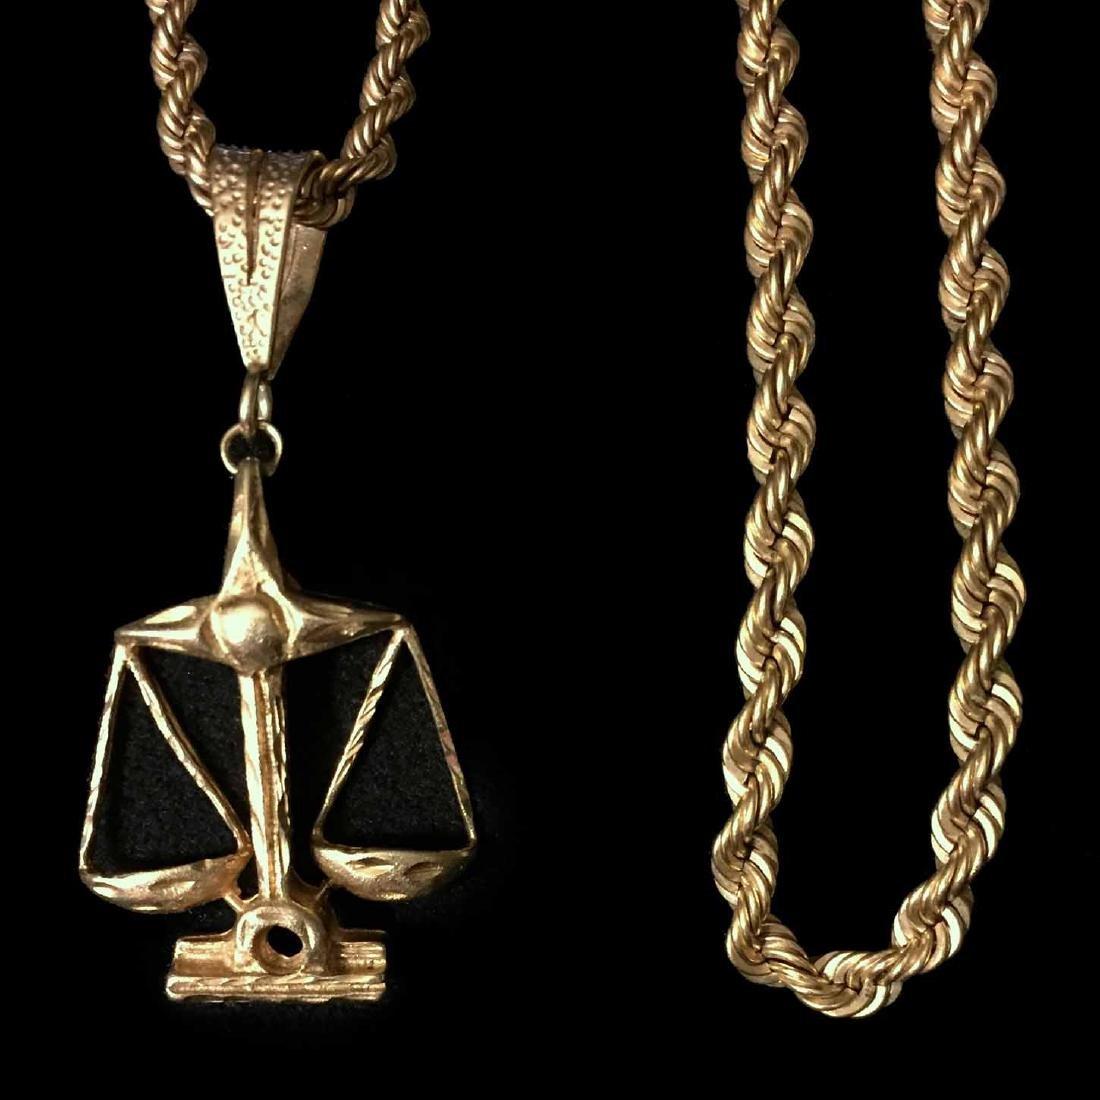 Gold Scale Pendant Necklace